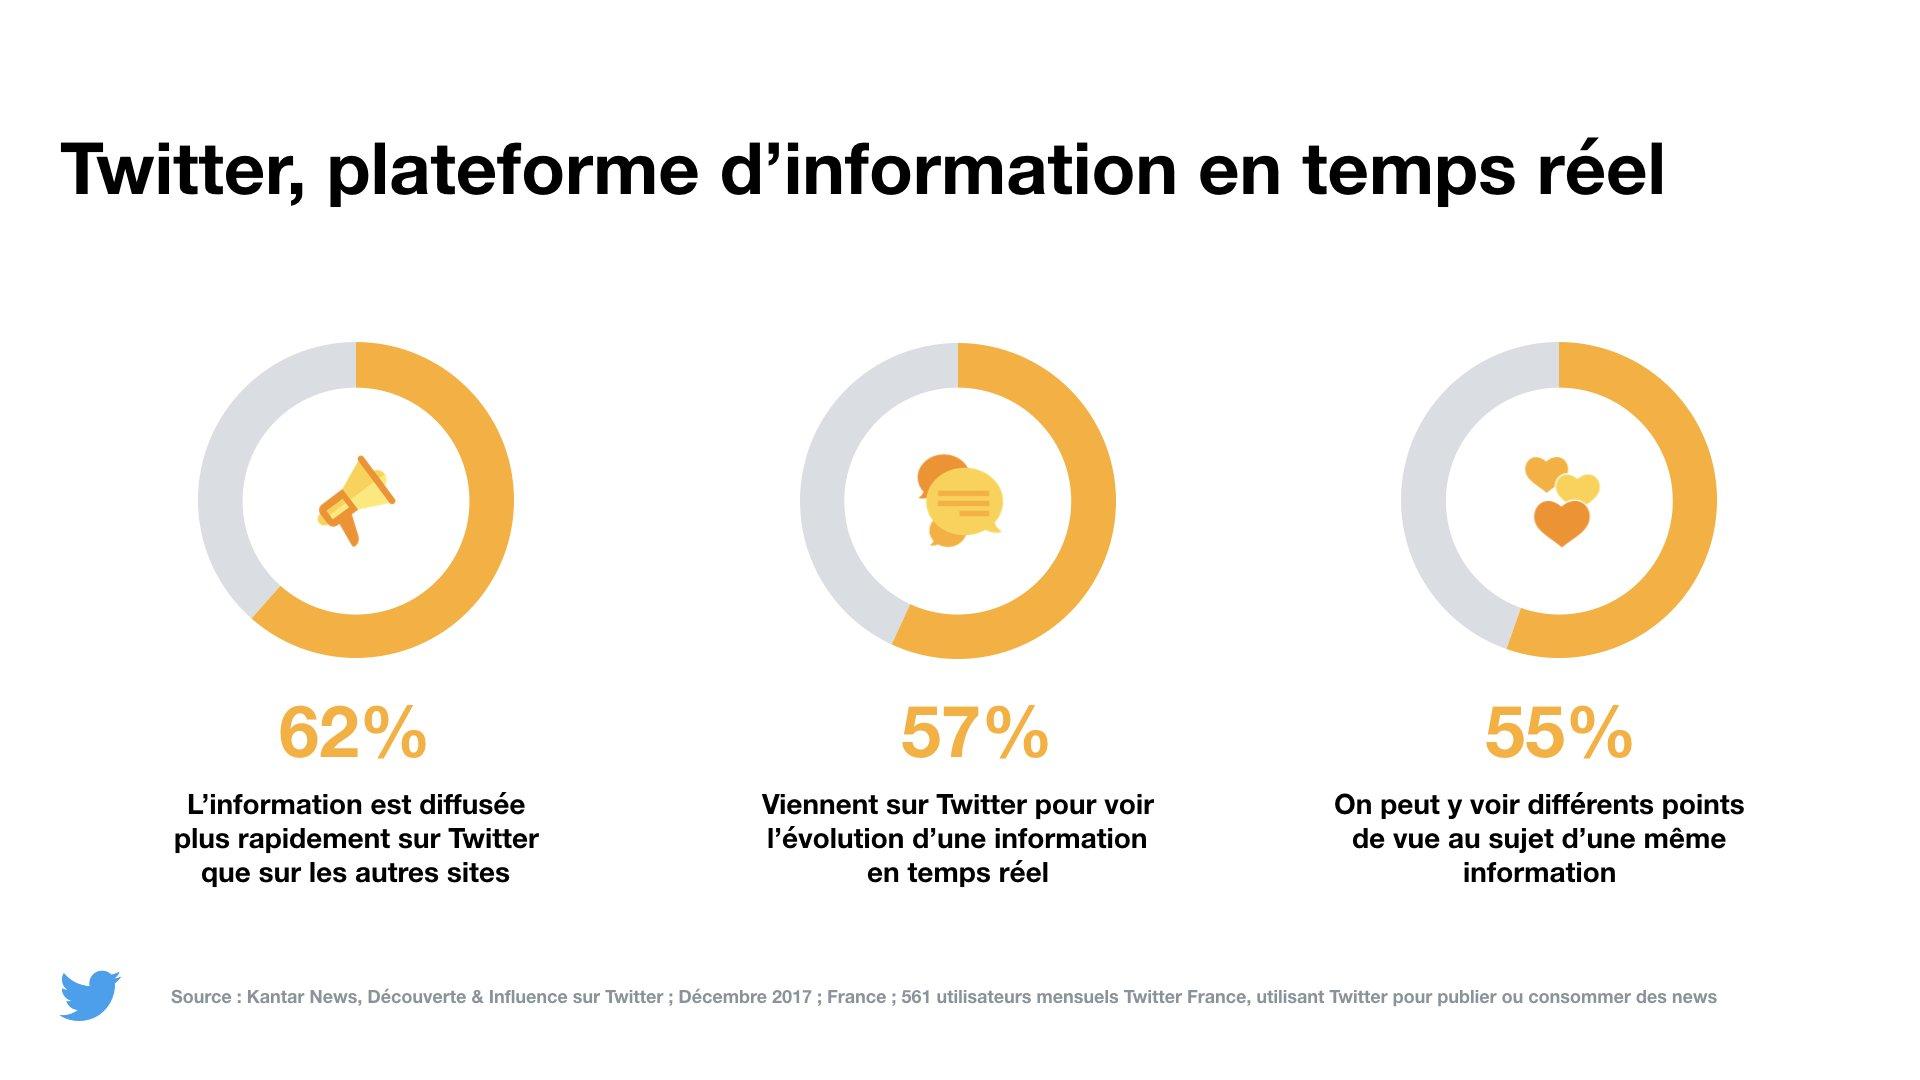 Twitter, plateforme d'information en temps réel. Kantar pour Twitter France